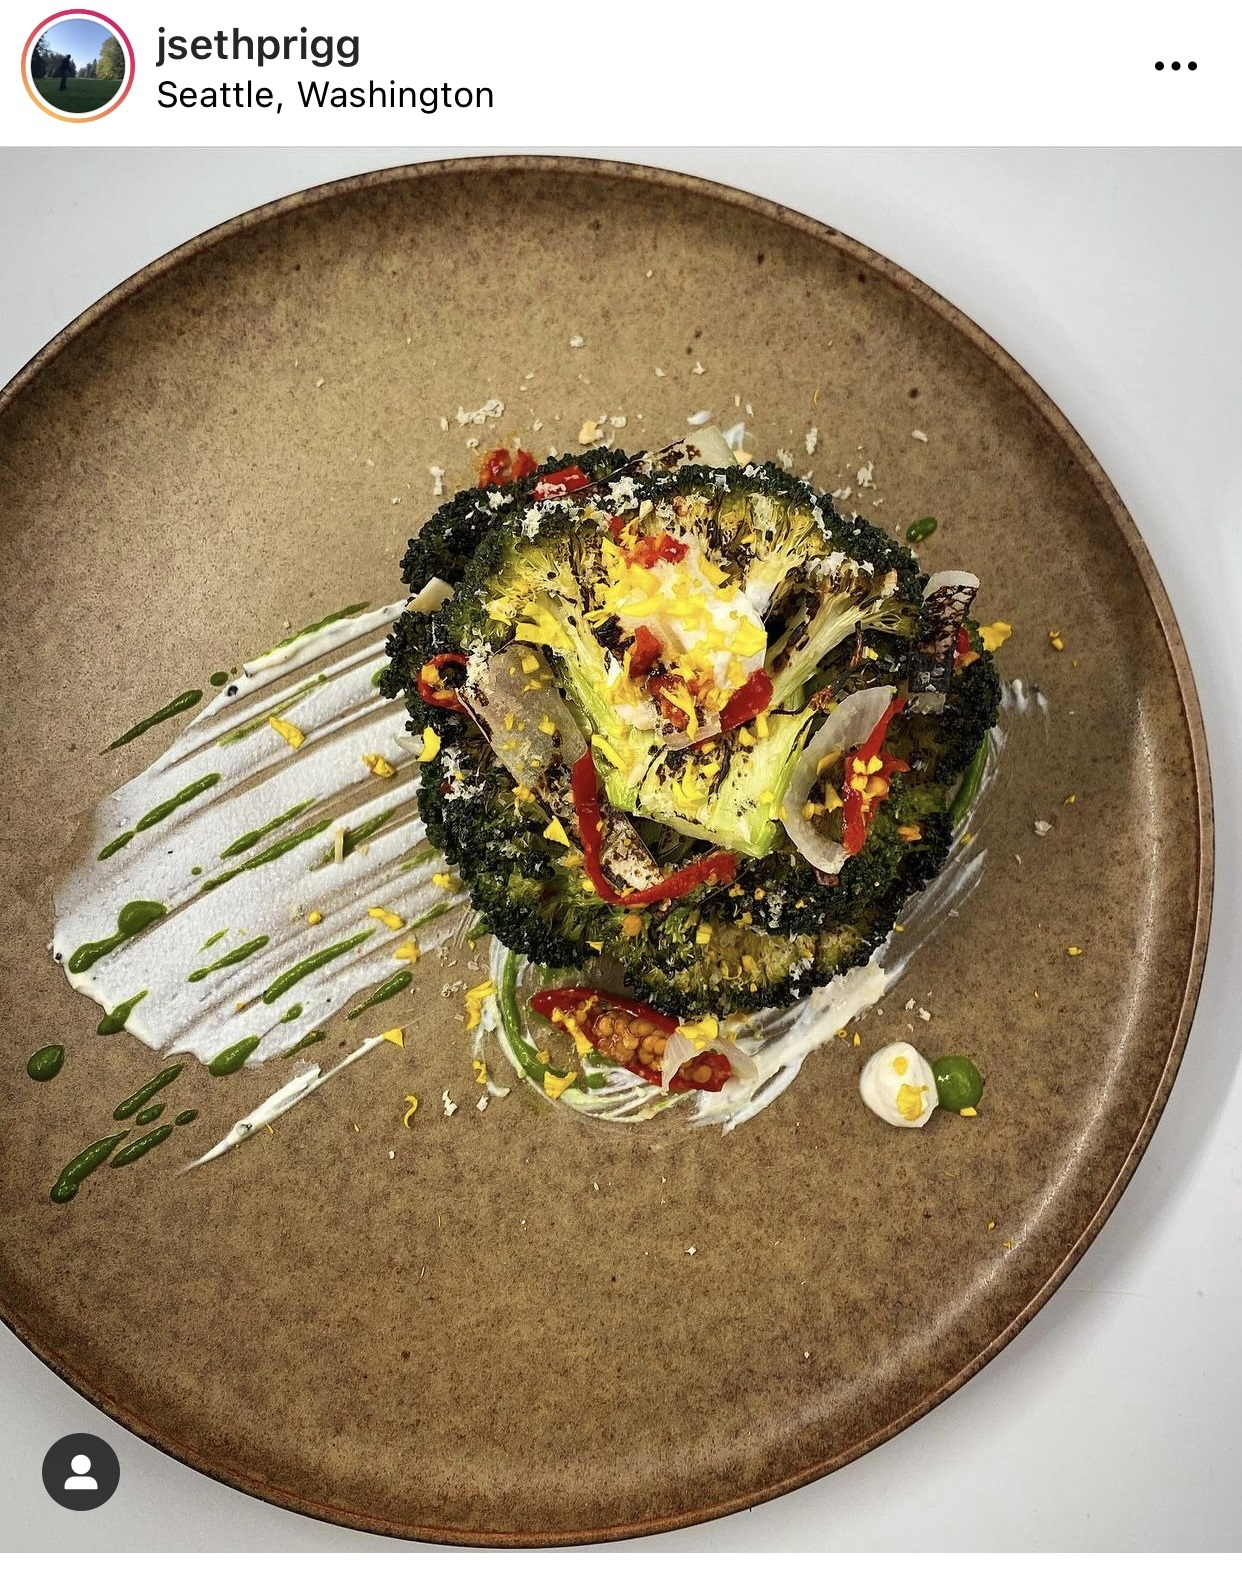 Seth Prigg food art Instagram post